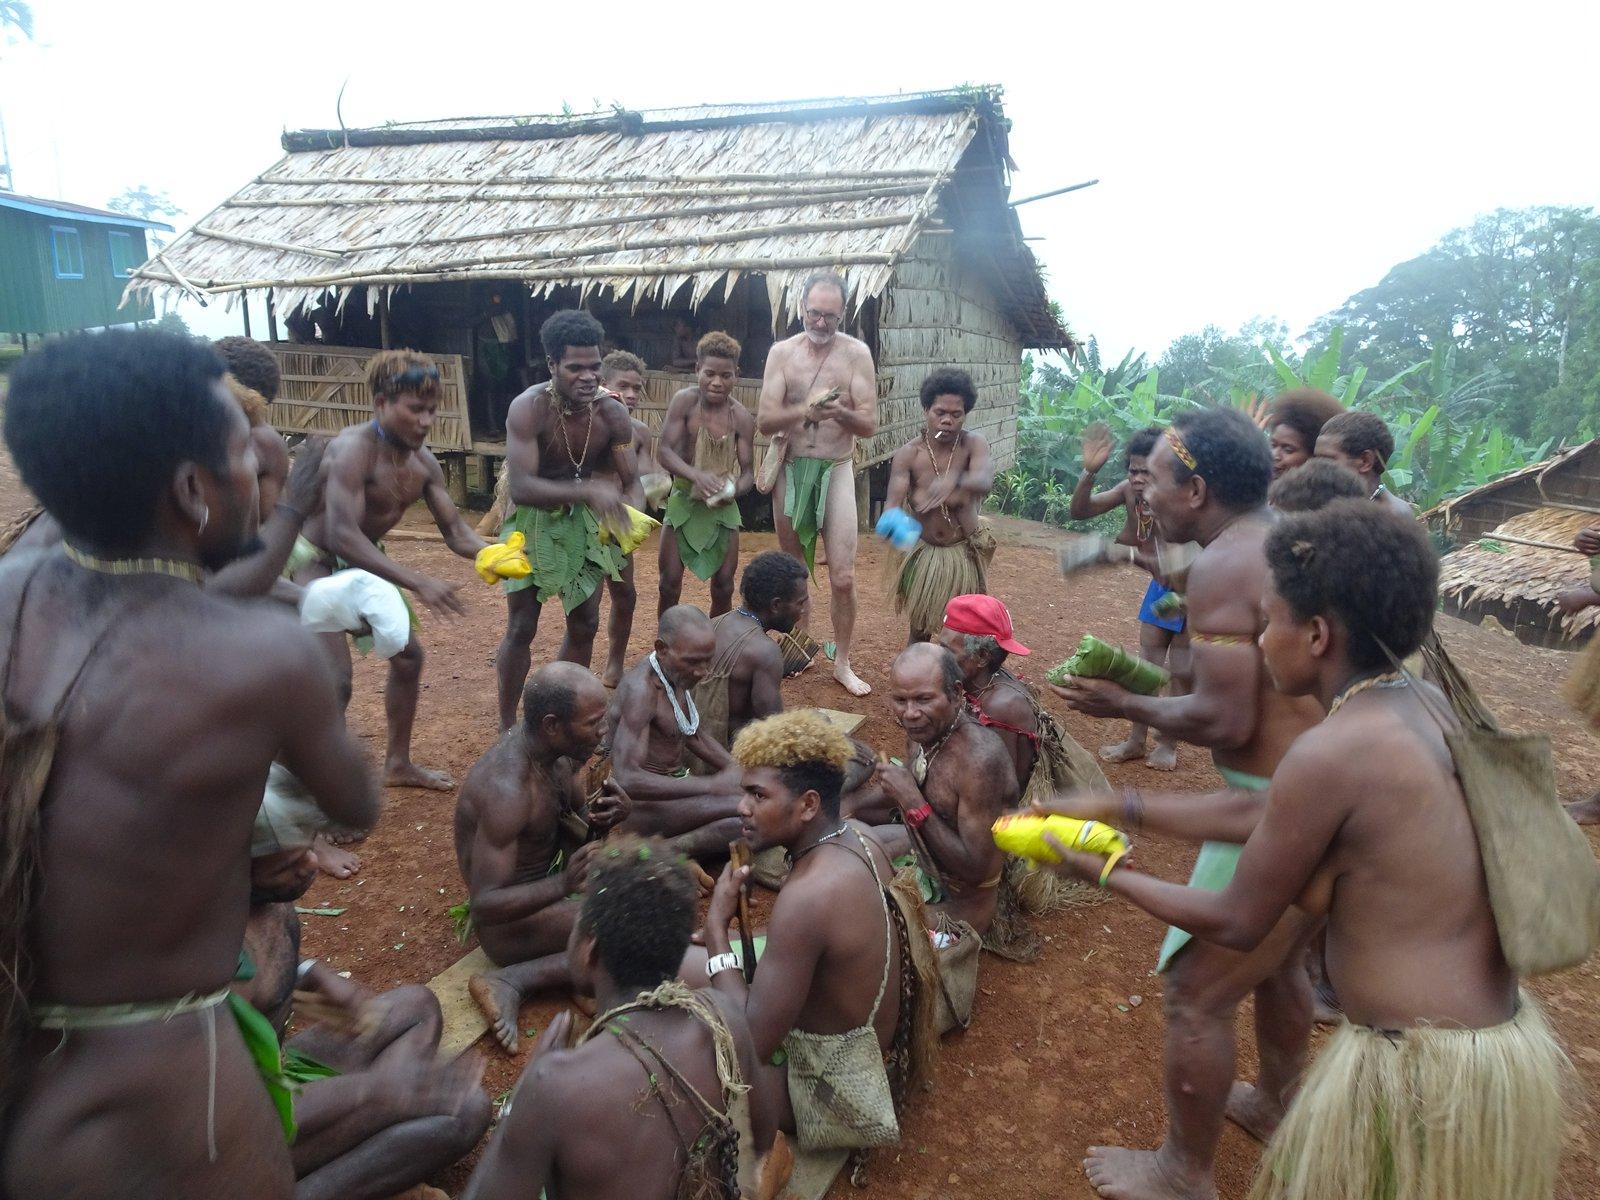 Solomon Islands Expedition - Ornithology - Joyous Binu-Binu